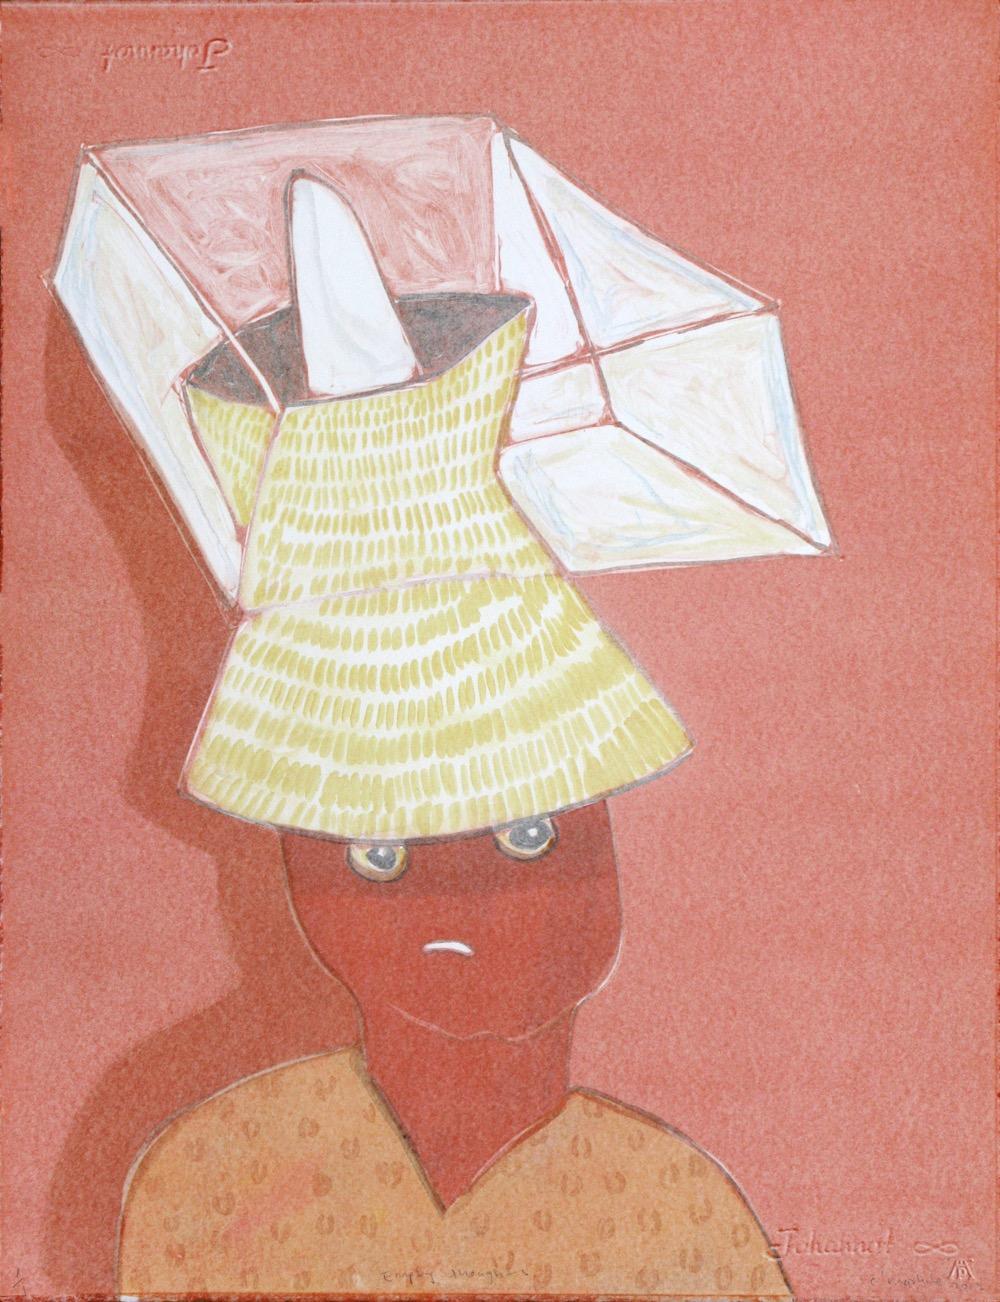 colbert mashile, art south africa, south african art, original prints